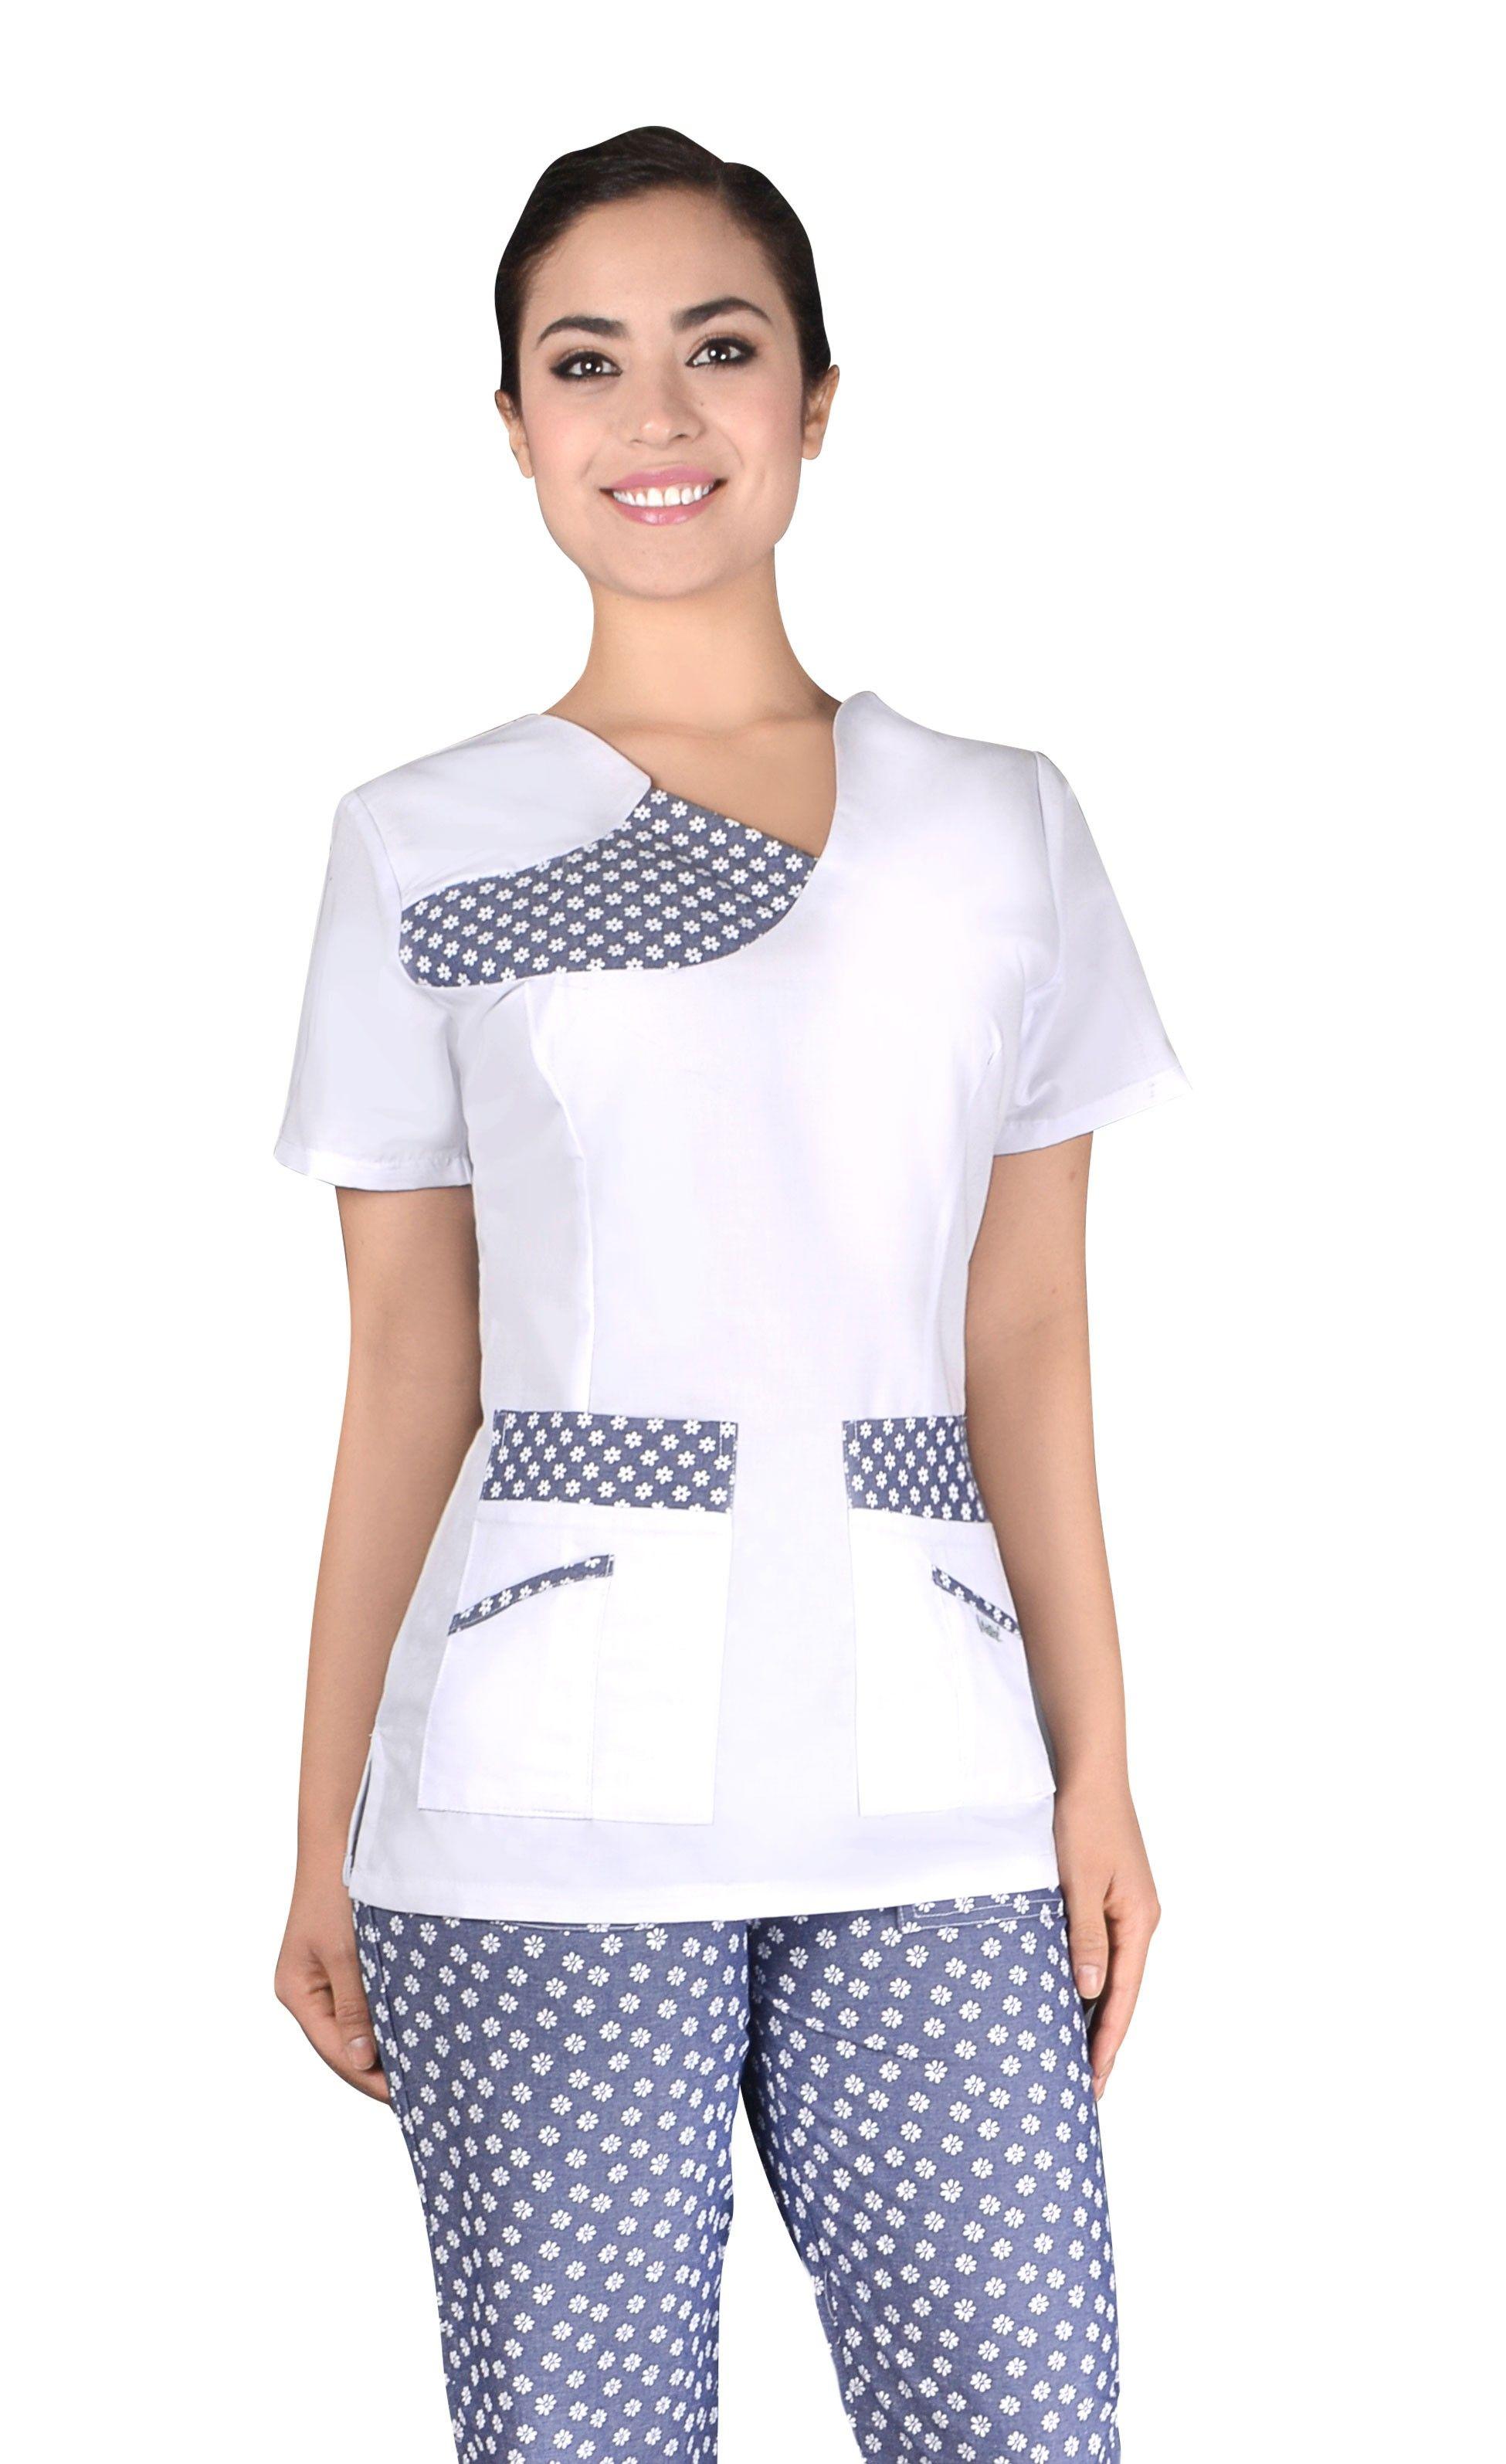 Qx 52 blanco fantasia mezclilla uniformes para - Uniformes sanitarios modernos ...